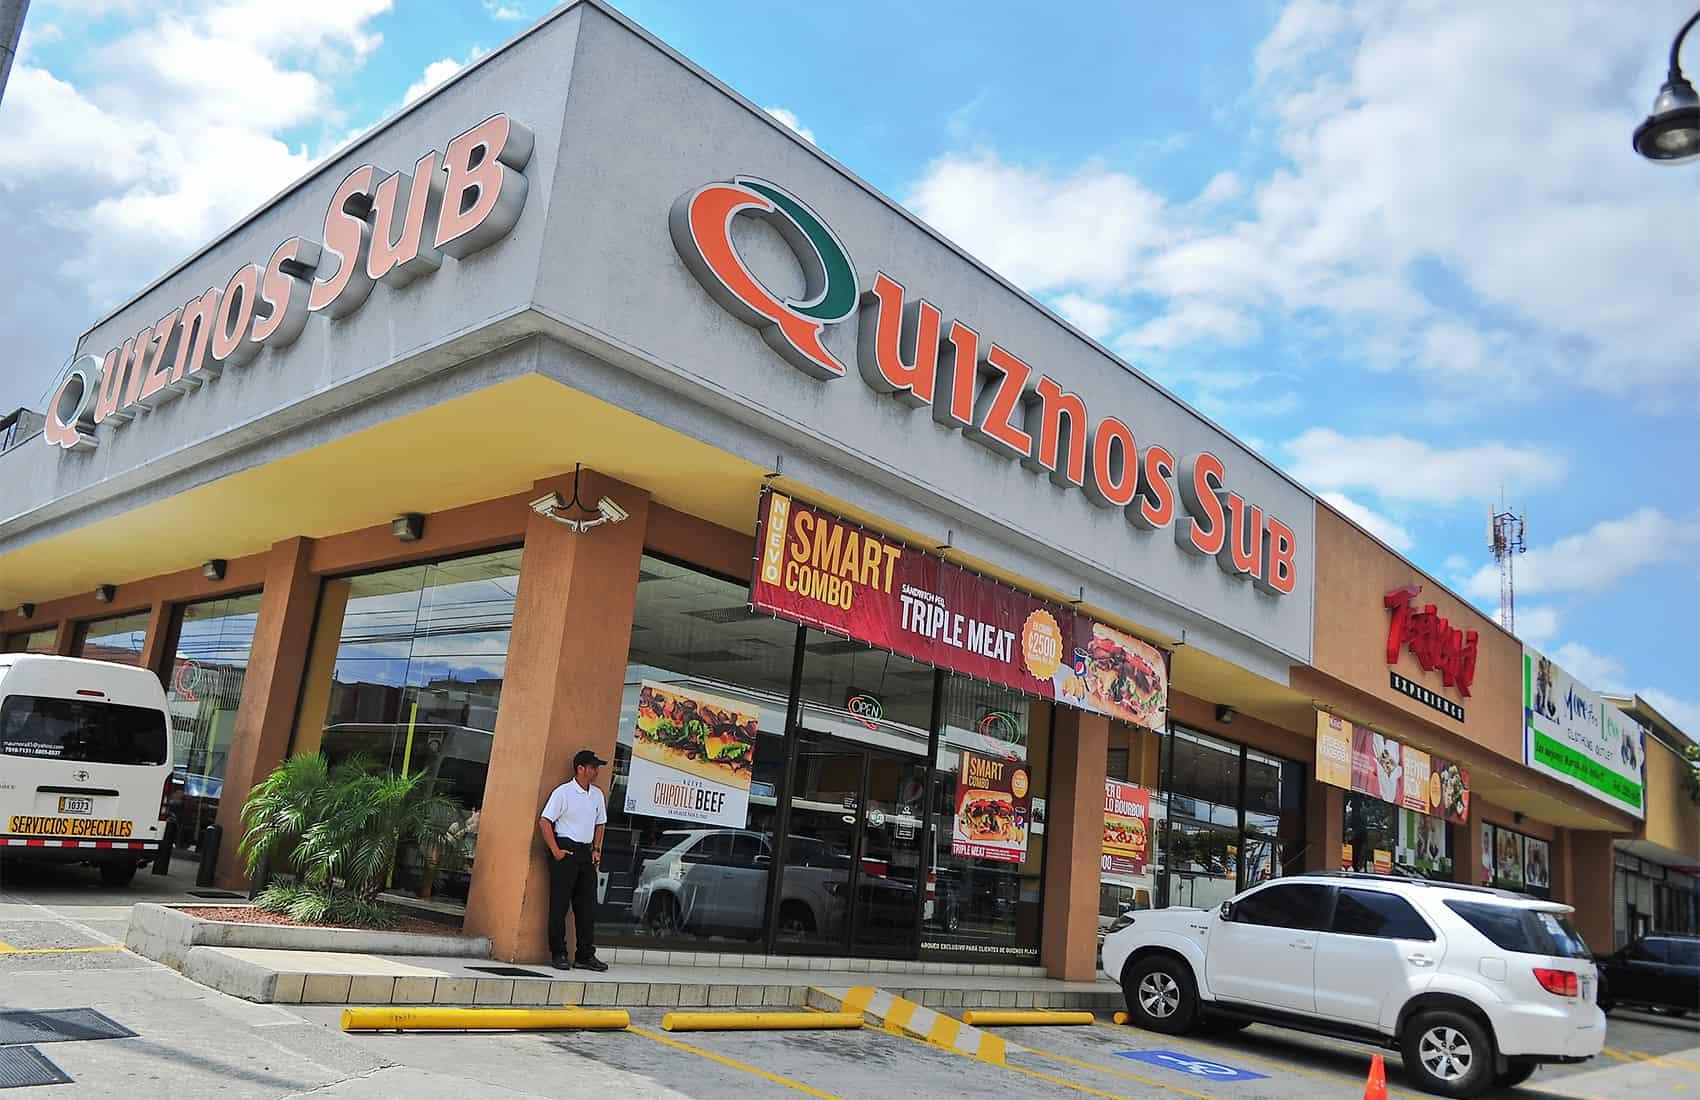 Quiznos subs & Teriyaki restaurants